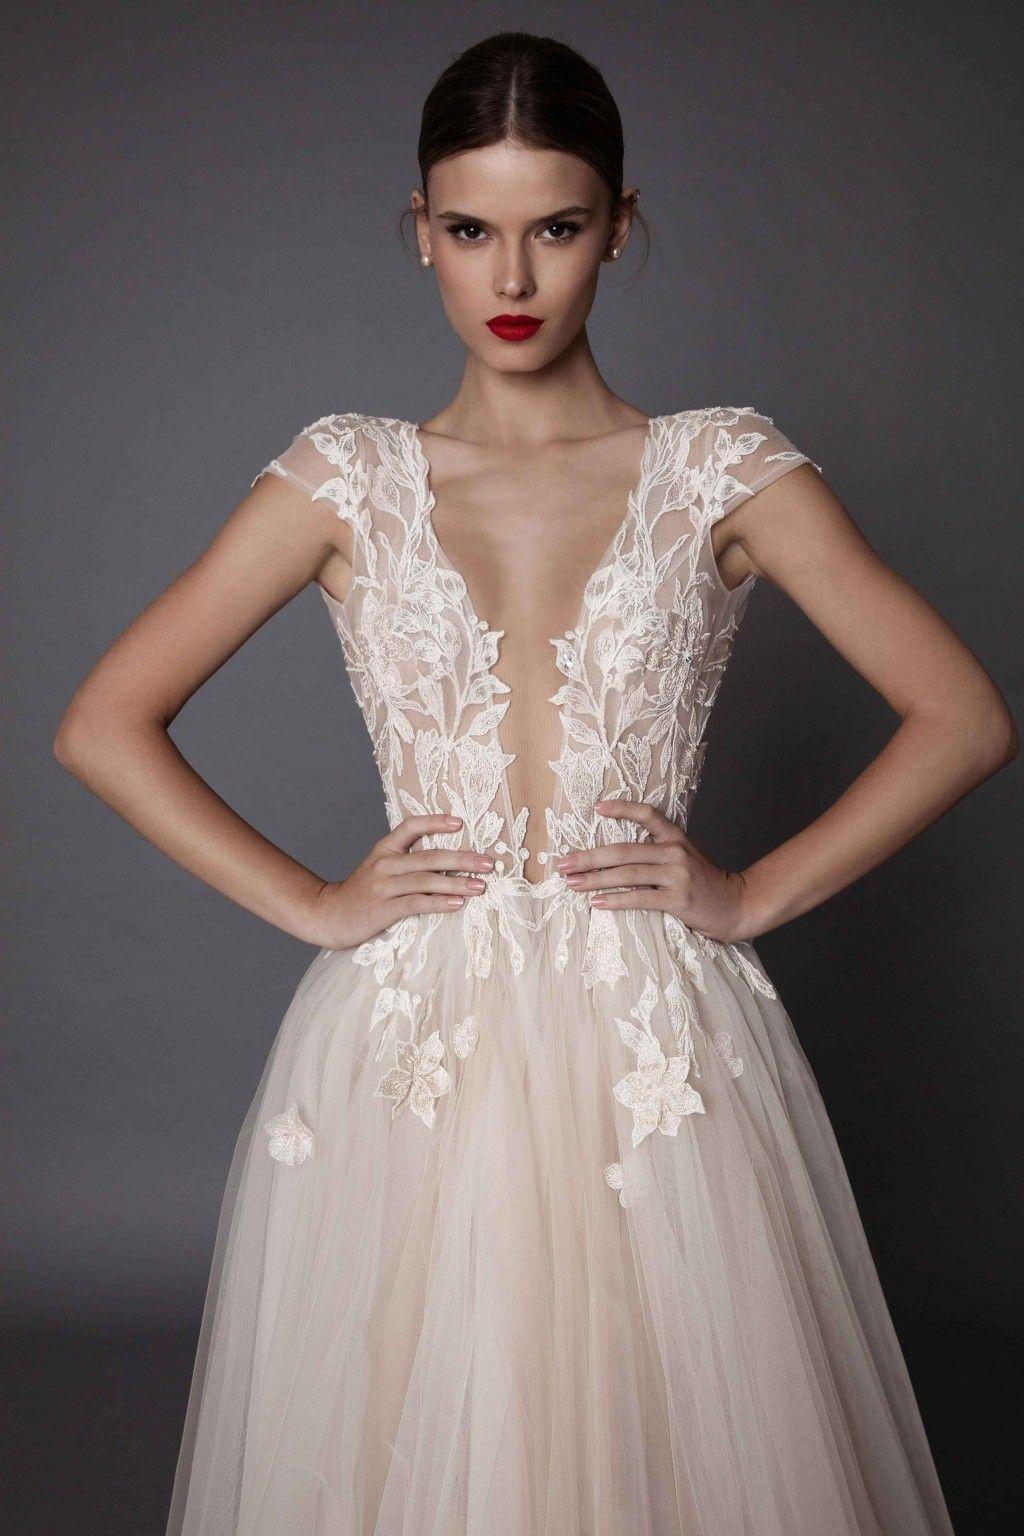 Sexy Berta 2019 Wedding Dresses Backless High Side Split Boho Wedding Gowns Bohemian Tulle A Line Bridal Dress